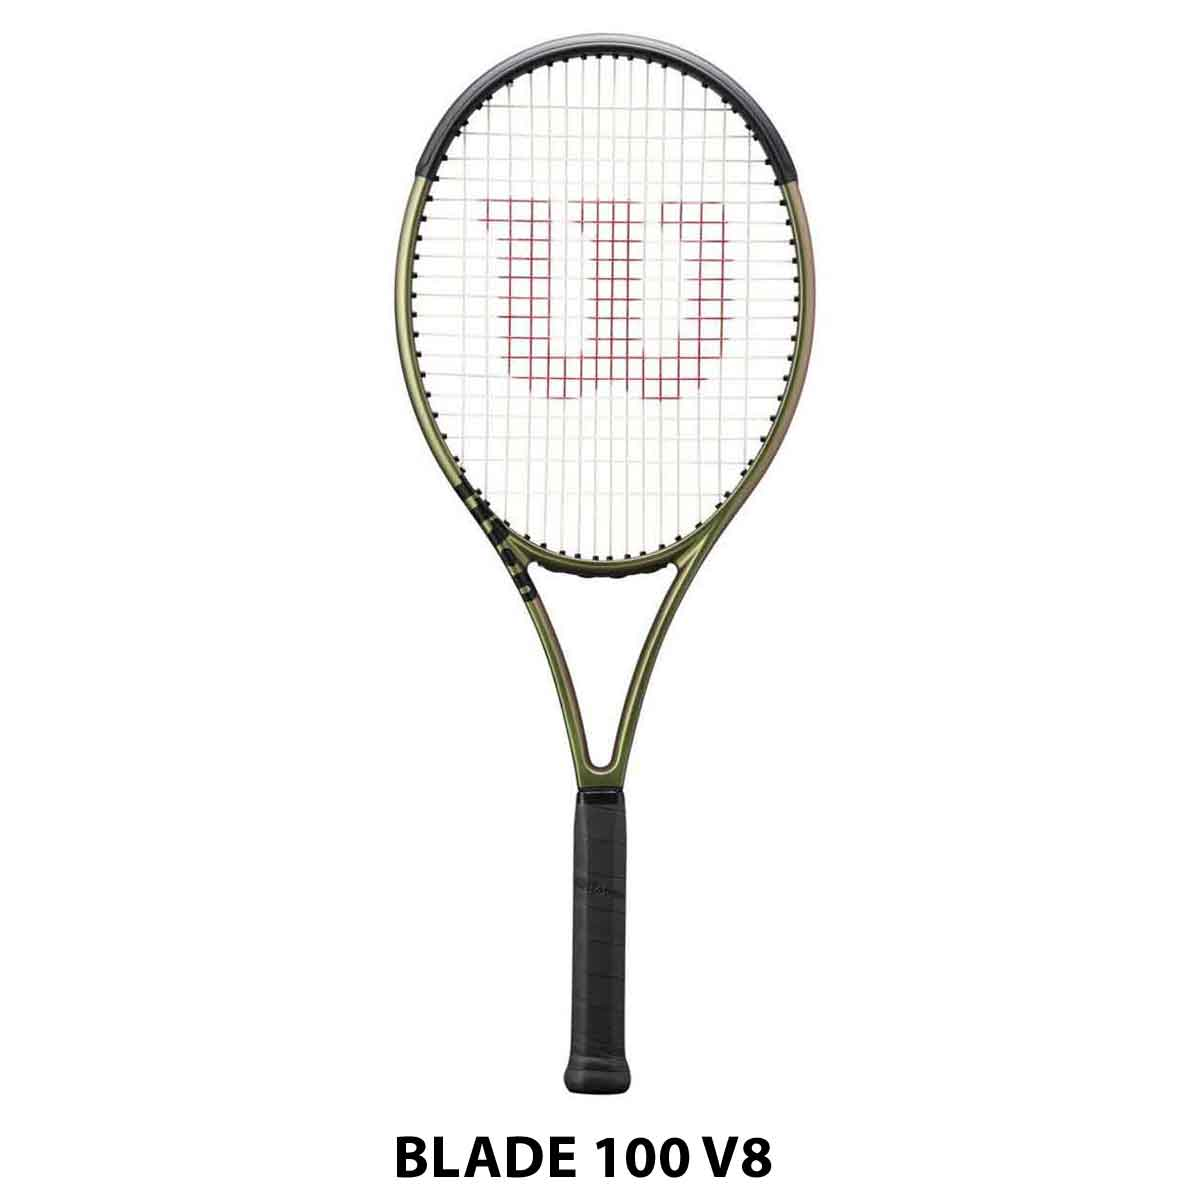 WILSON BLADE 100 V8